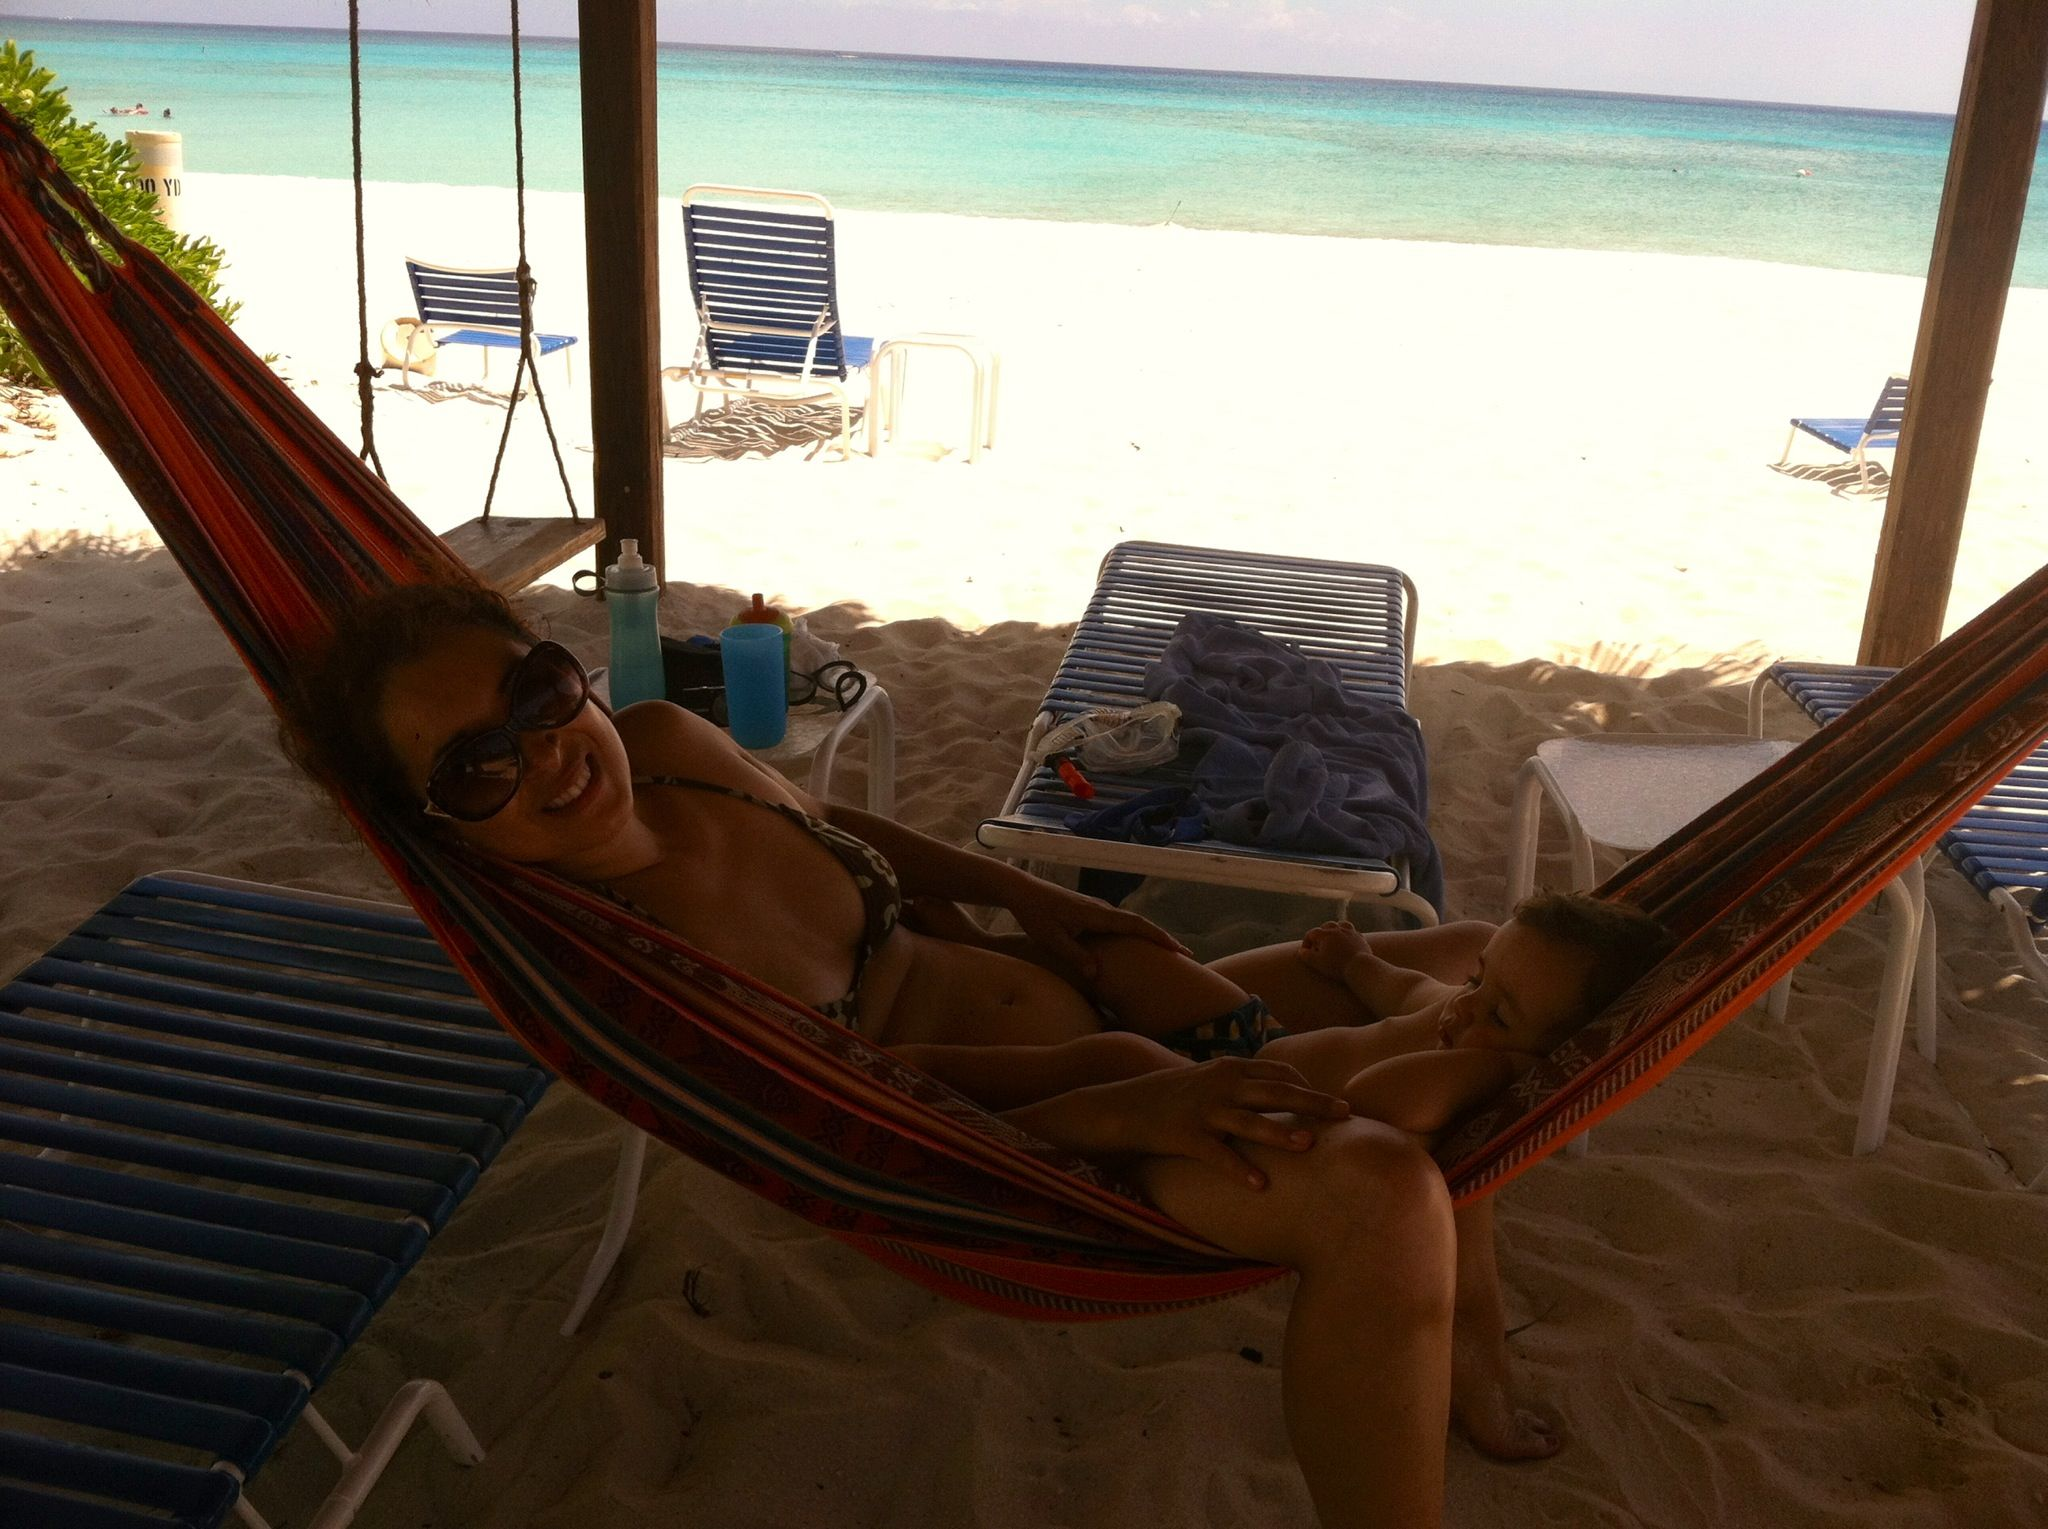 Grand Cayman Island Kid Friendly Gorgeous Beaches And